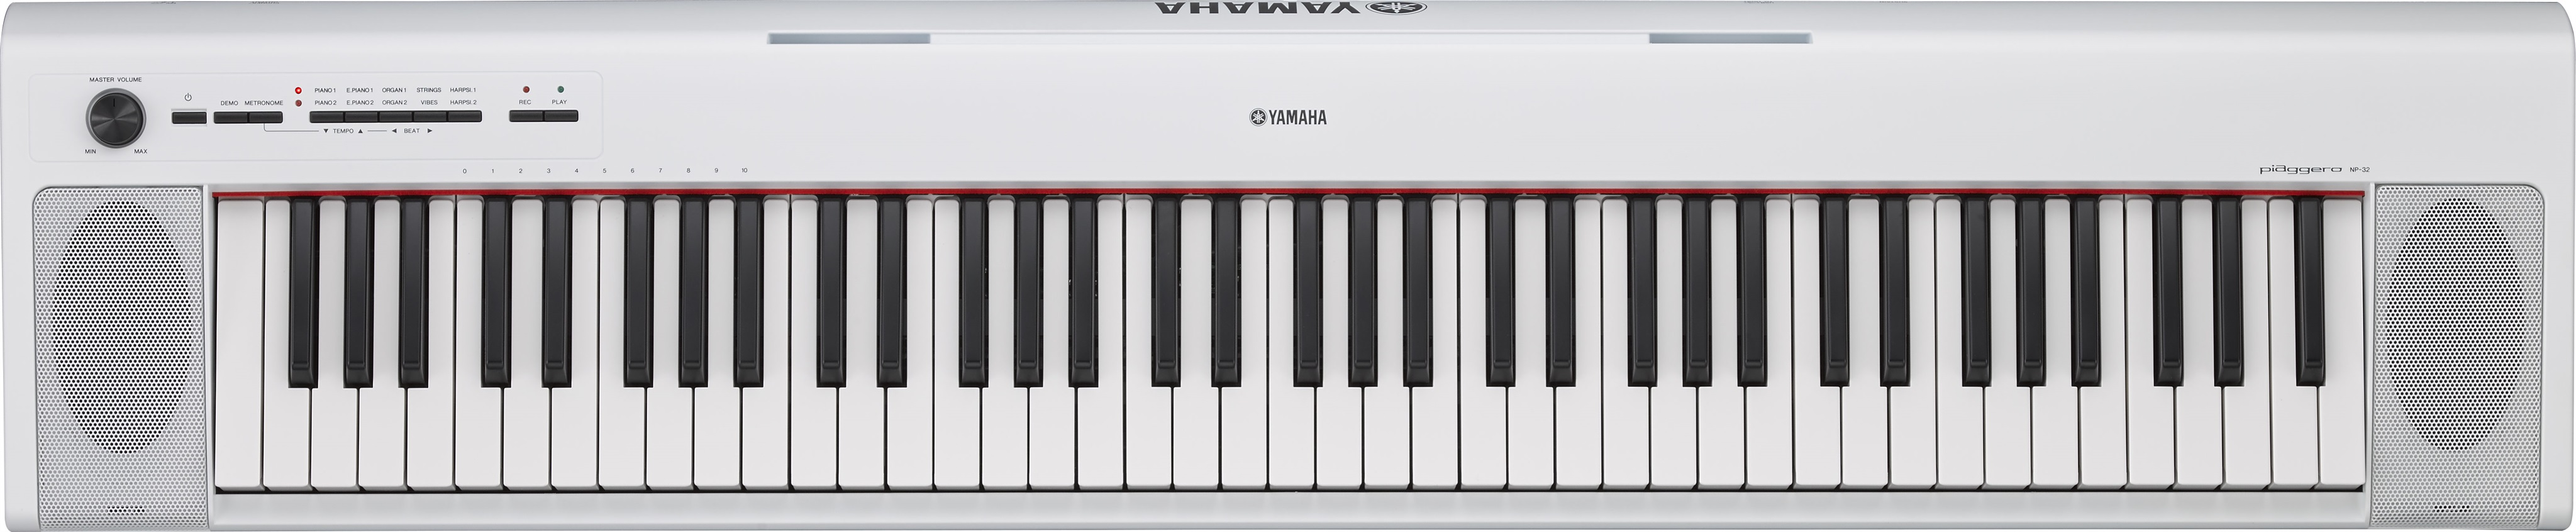 Yamaha NP-32 WH